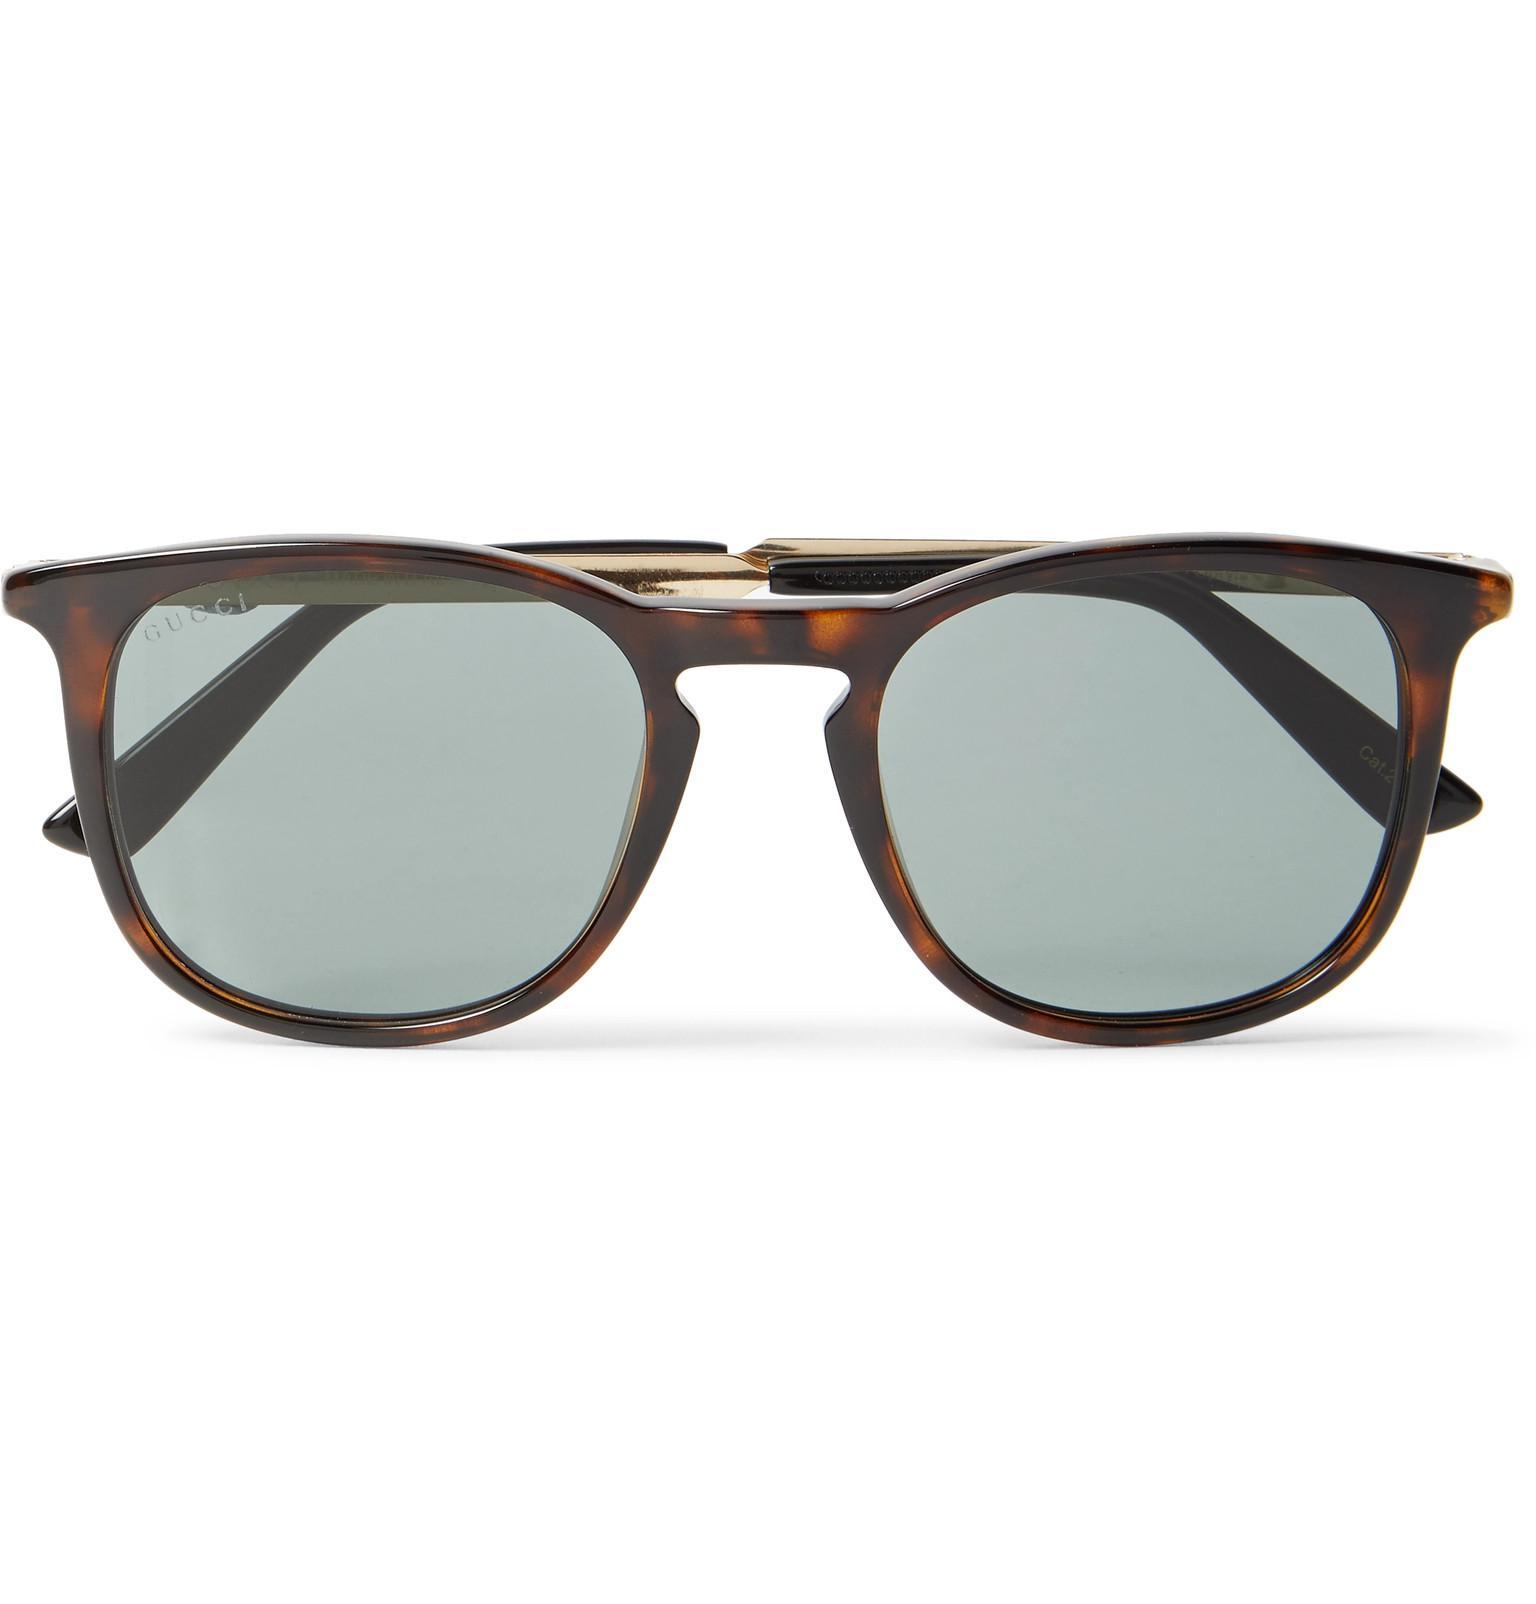 791c551fd10 Gucci. Men s Round-frame Tortoiseshell Acetate And Gold-tone Sunglasses